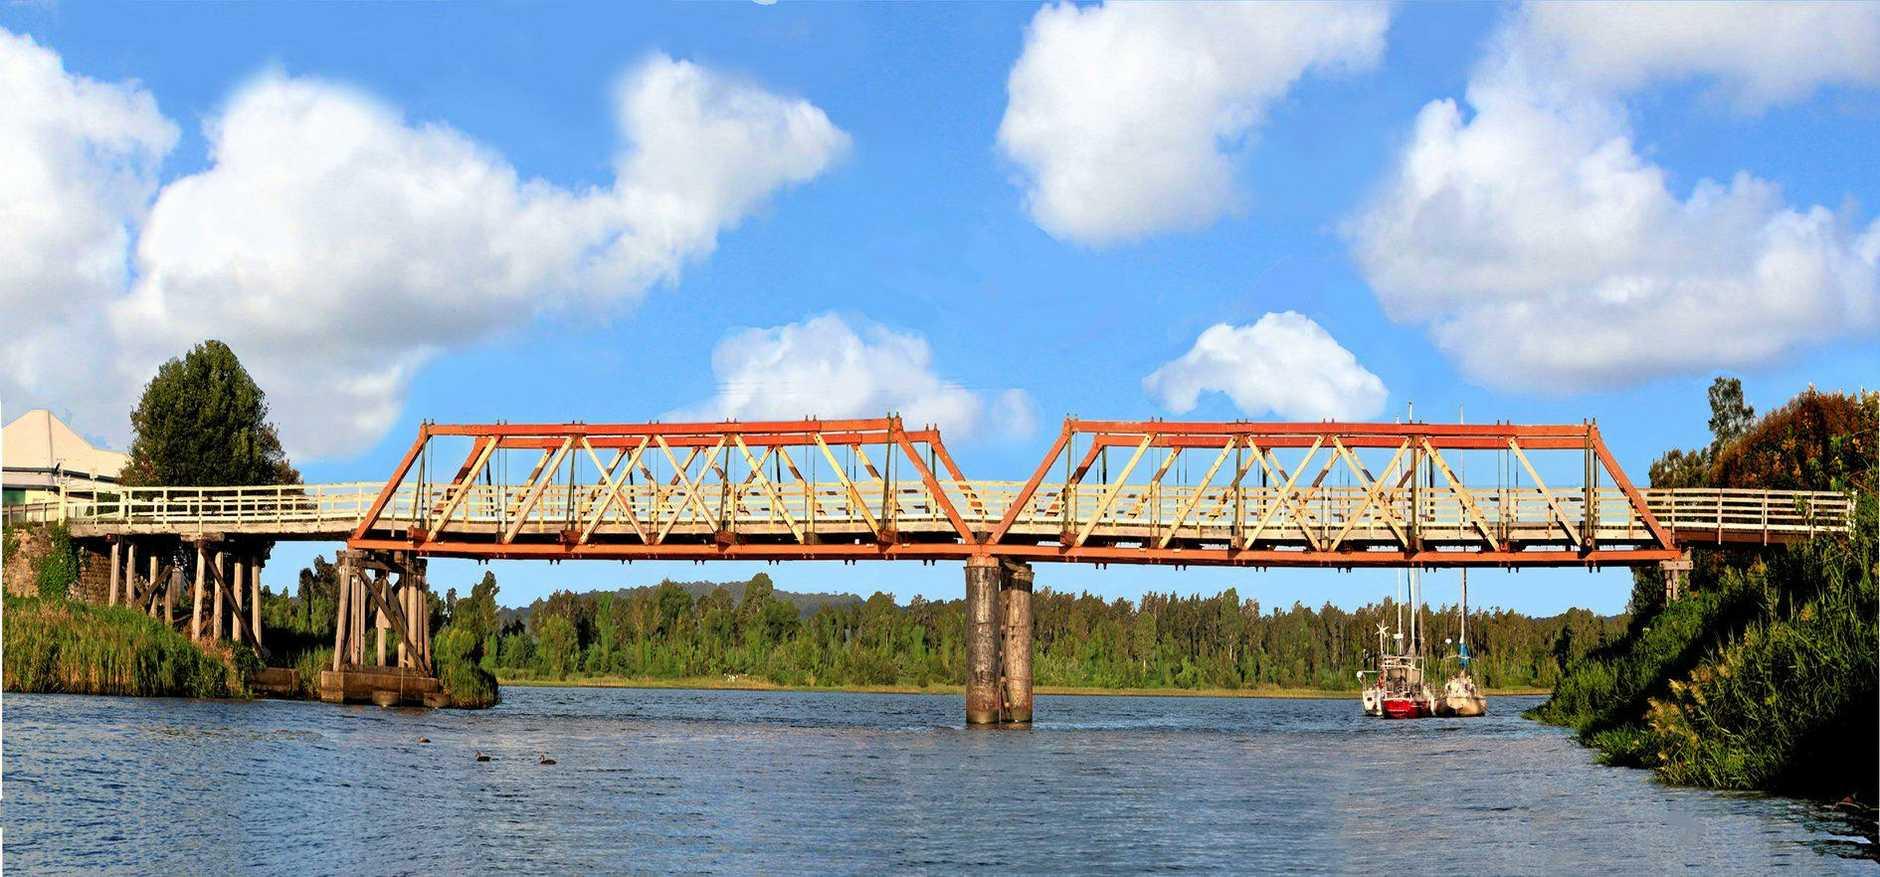 GONE BUT NOT FORGOTTEN: One of many stunning photos John Ibbotson has taken of the old Sportsmans Creek bridge.